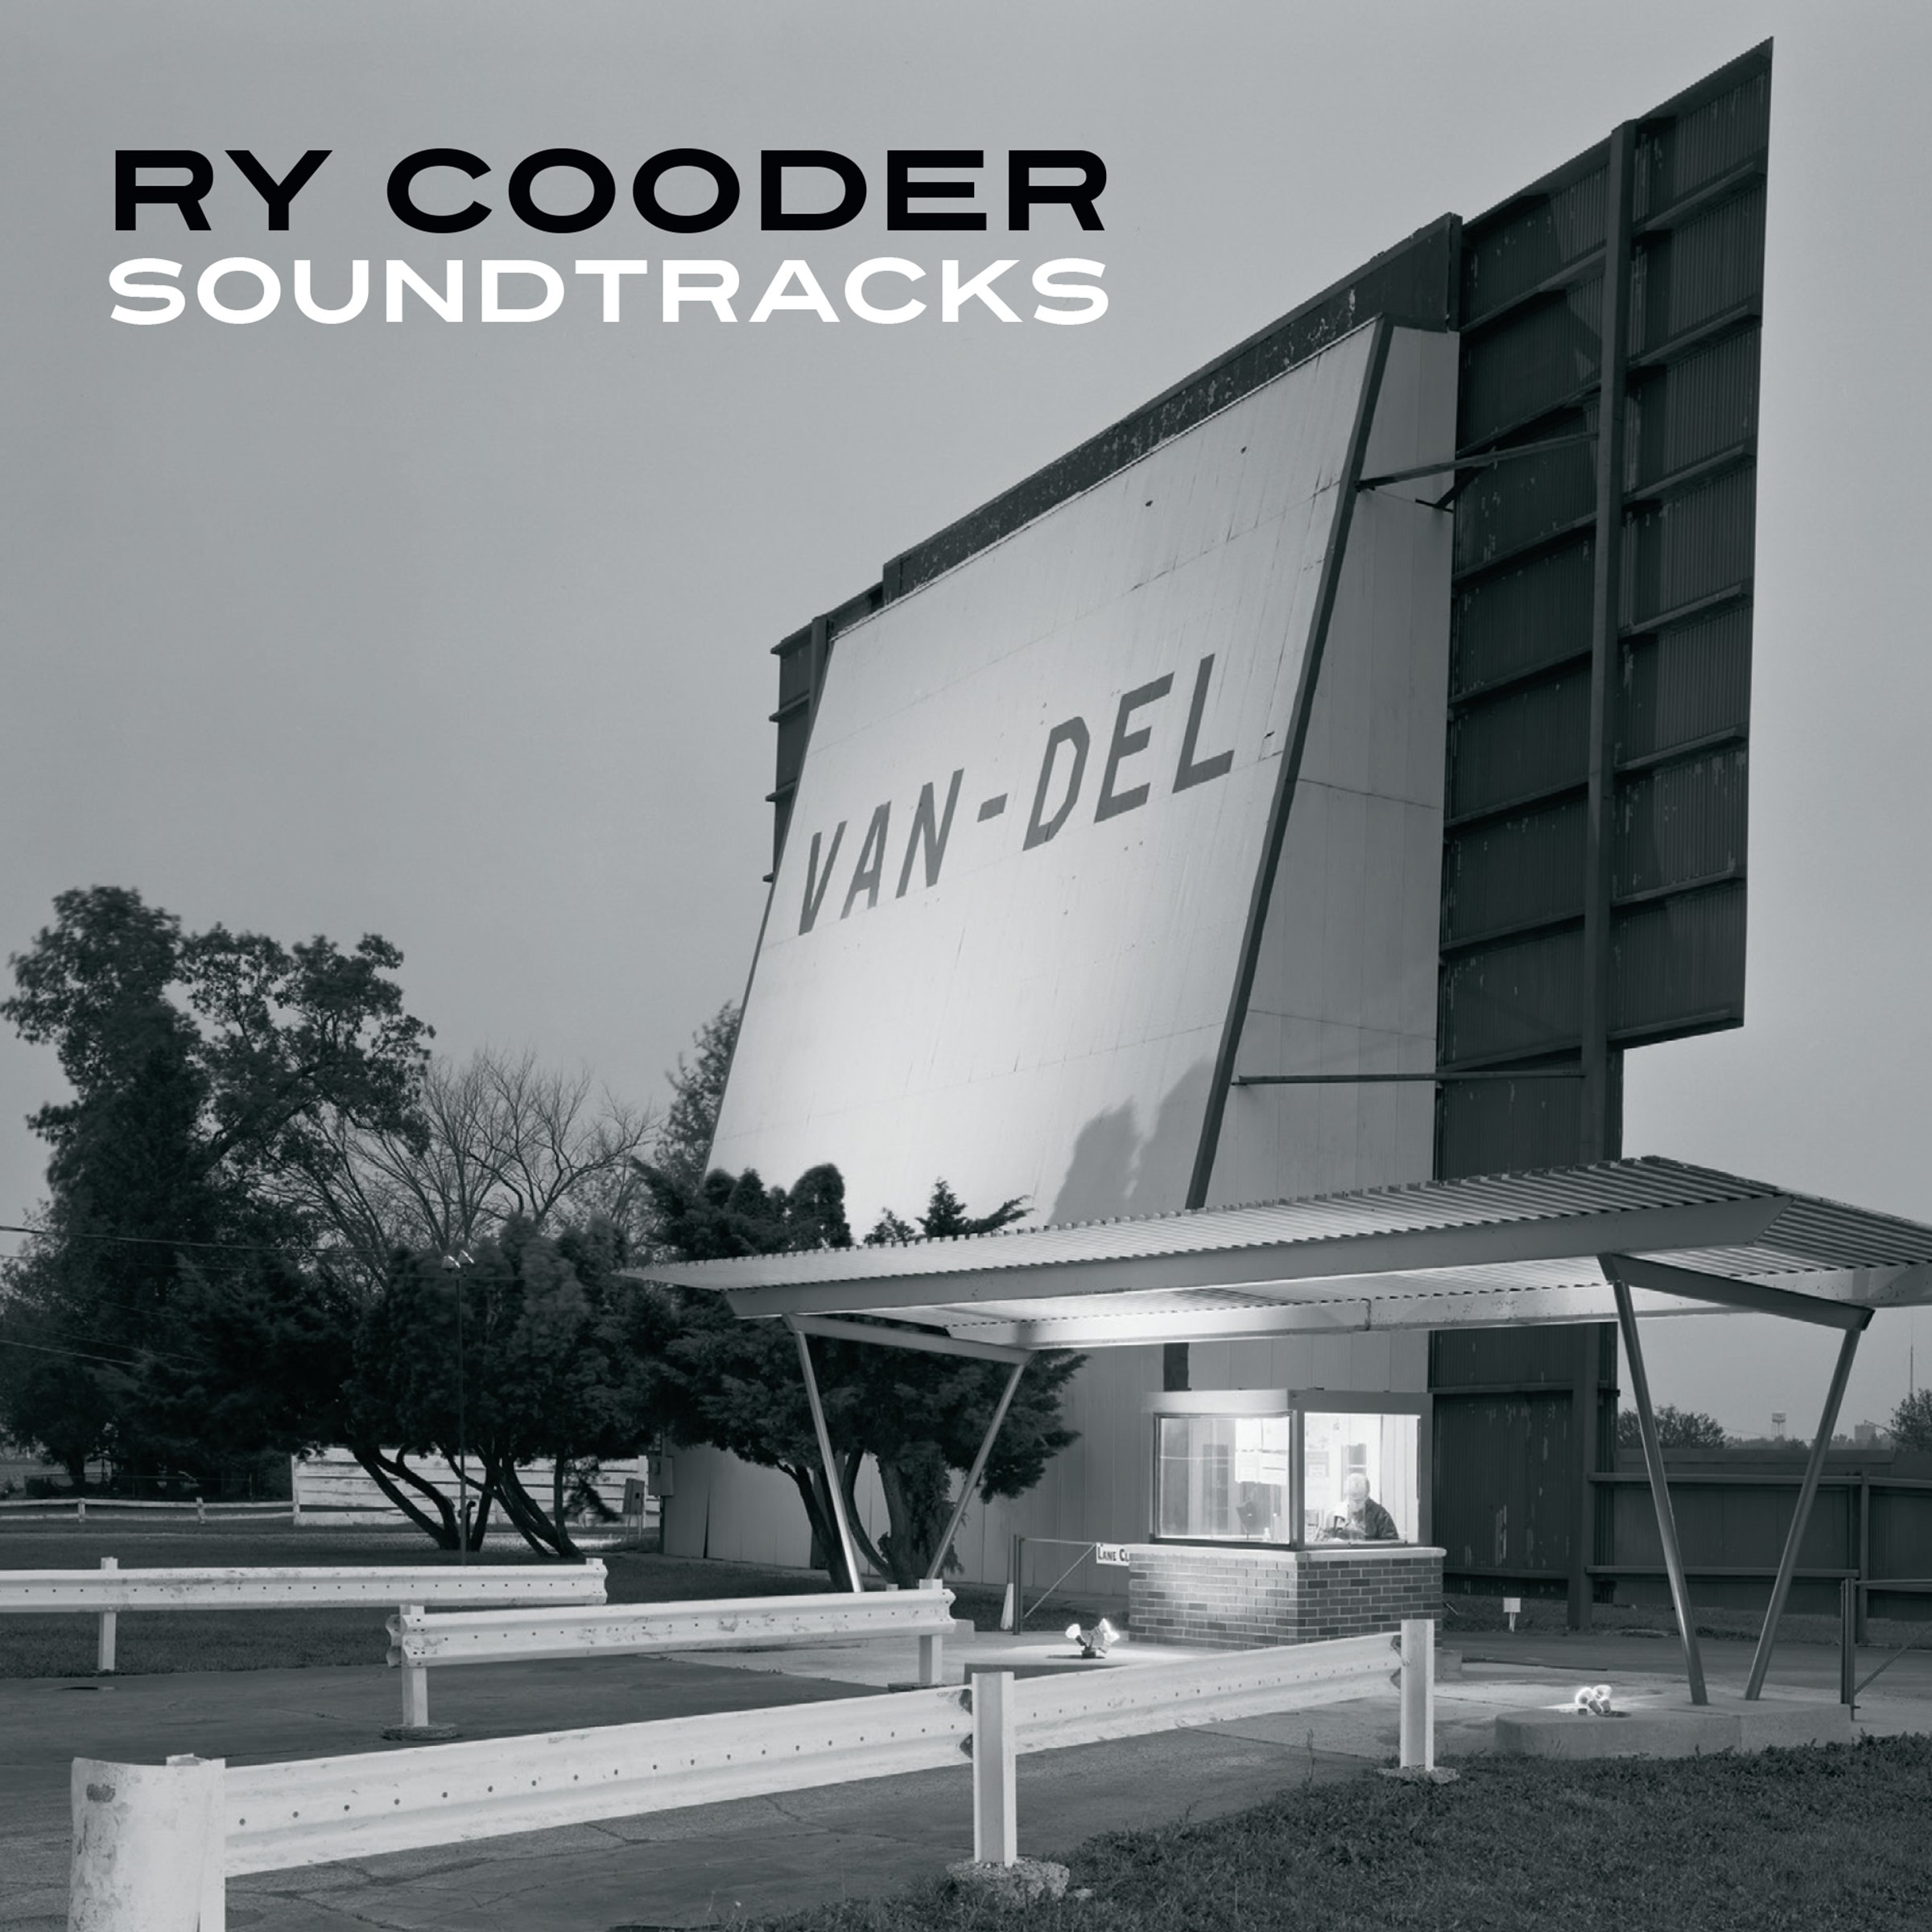 Soundtracks (7CD) by Rhino/Warner Bros.